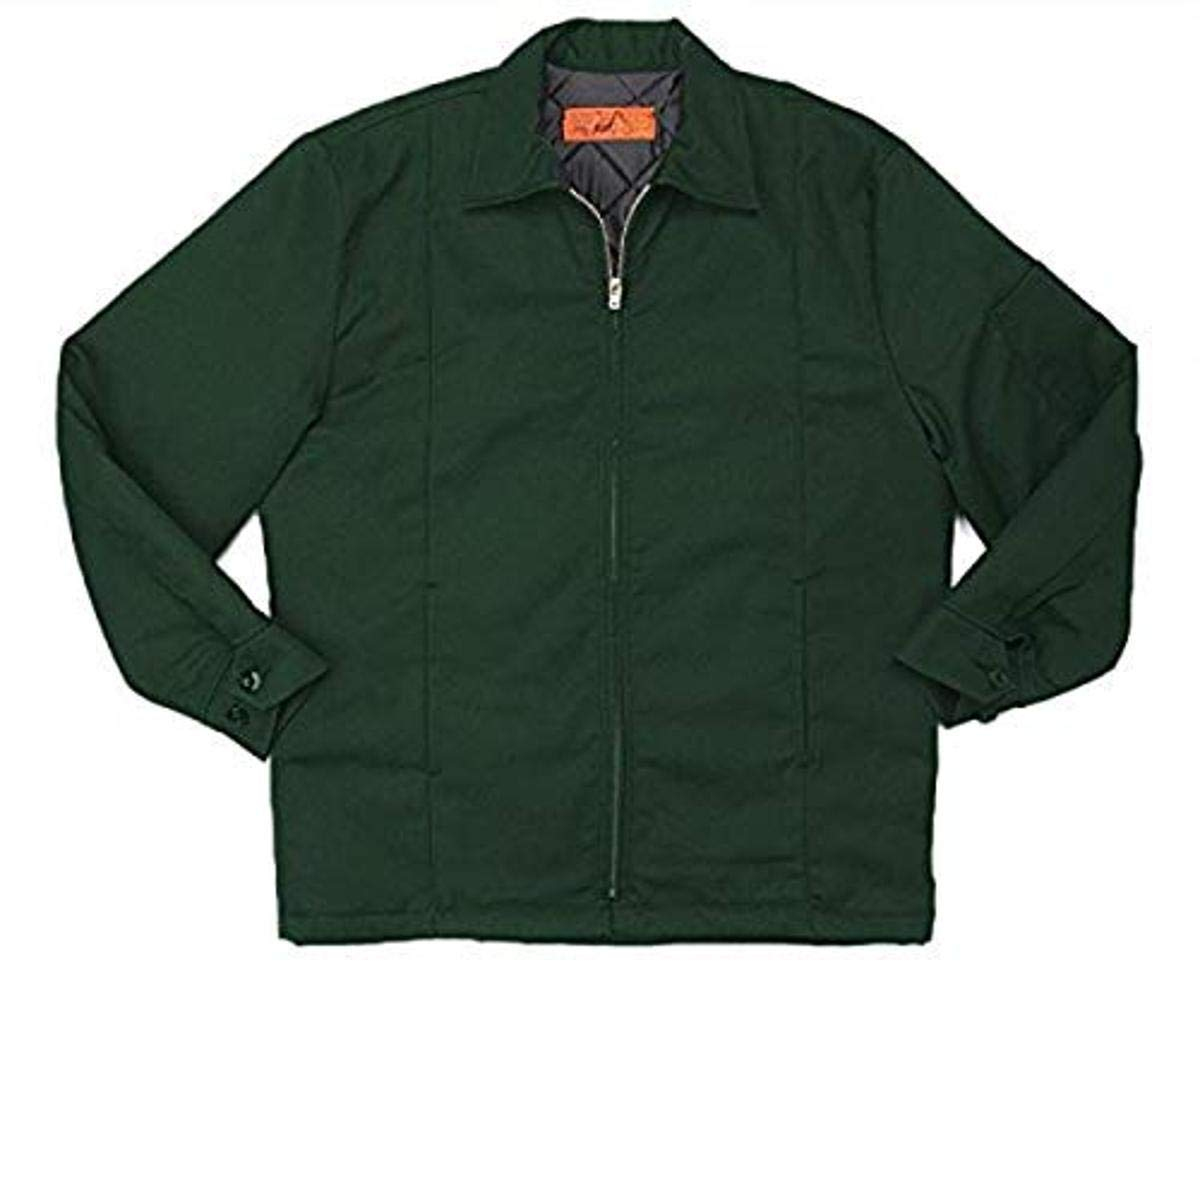 Pinnacle Textile JL14 7.5 OZ Twill, 65/35 Polyester/Cotton, Panel Jacket-XX-Large-Spruce Green